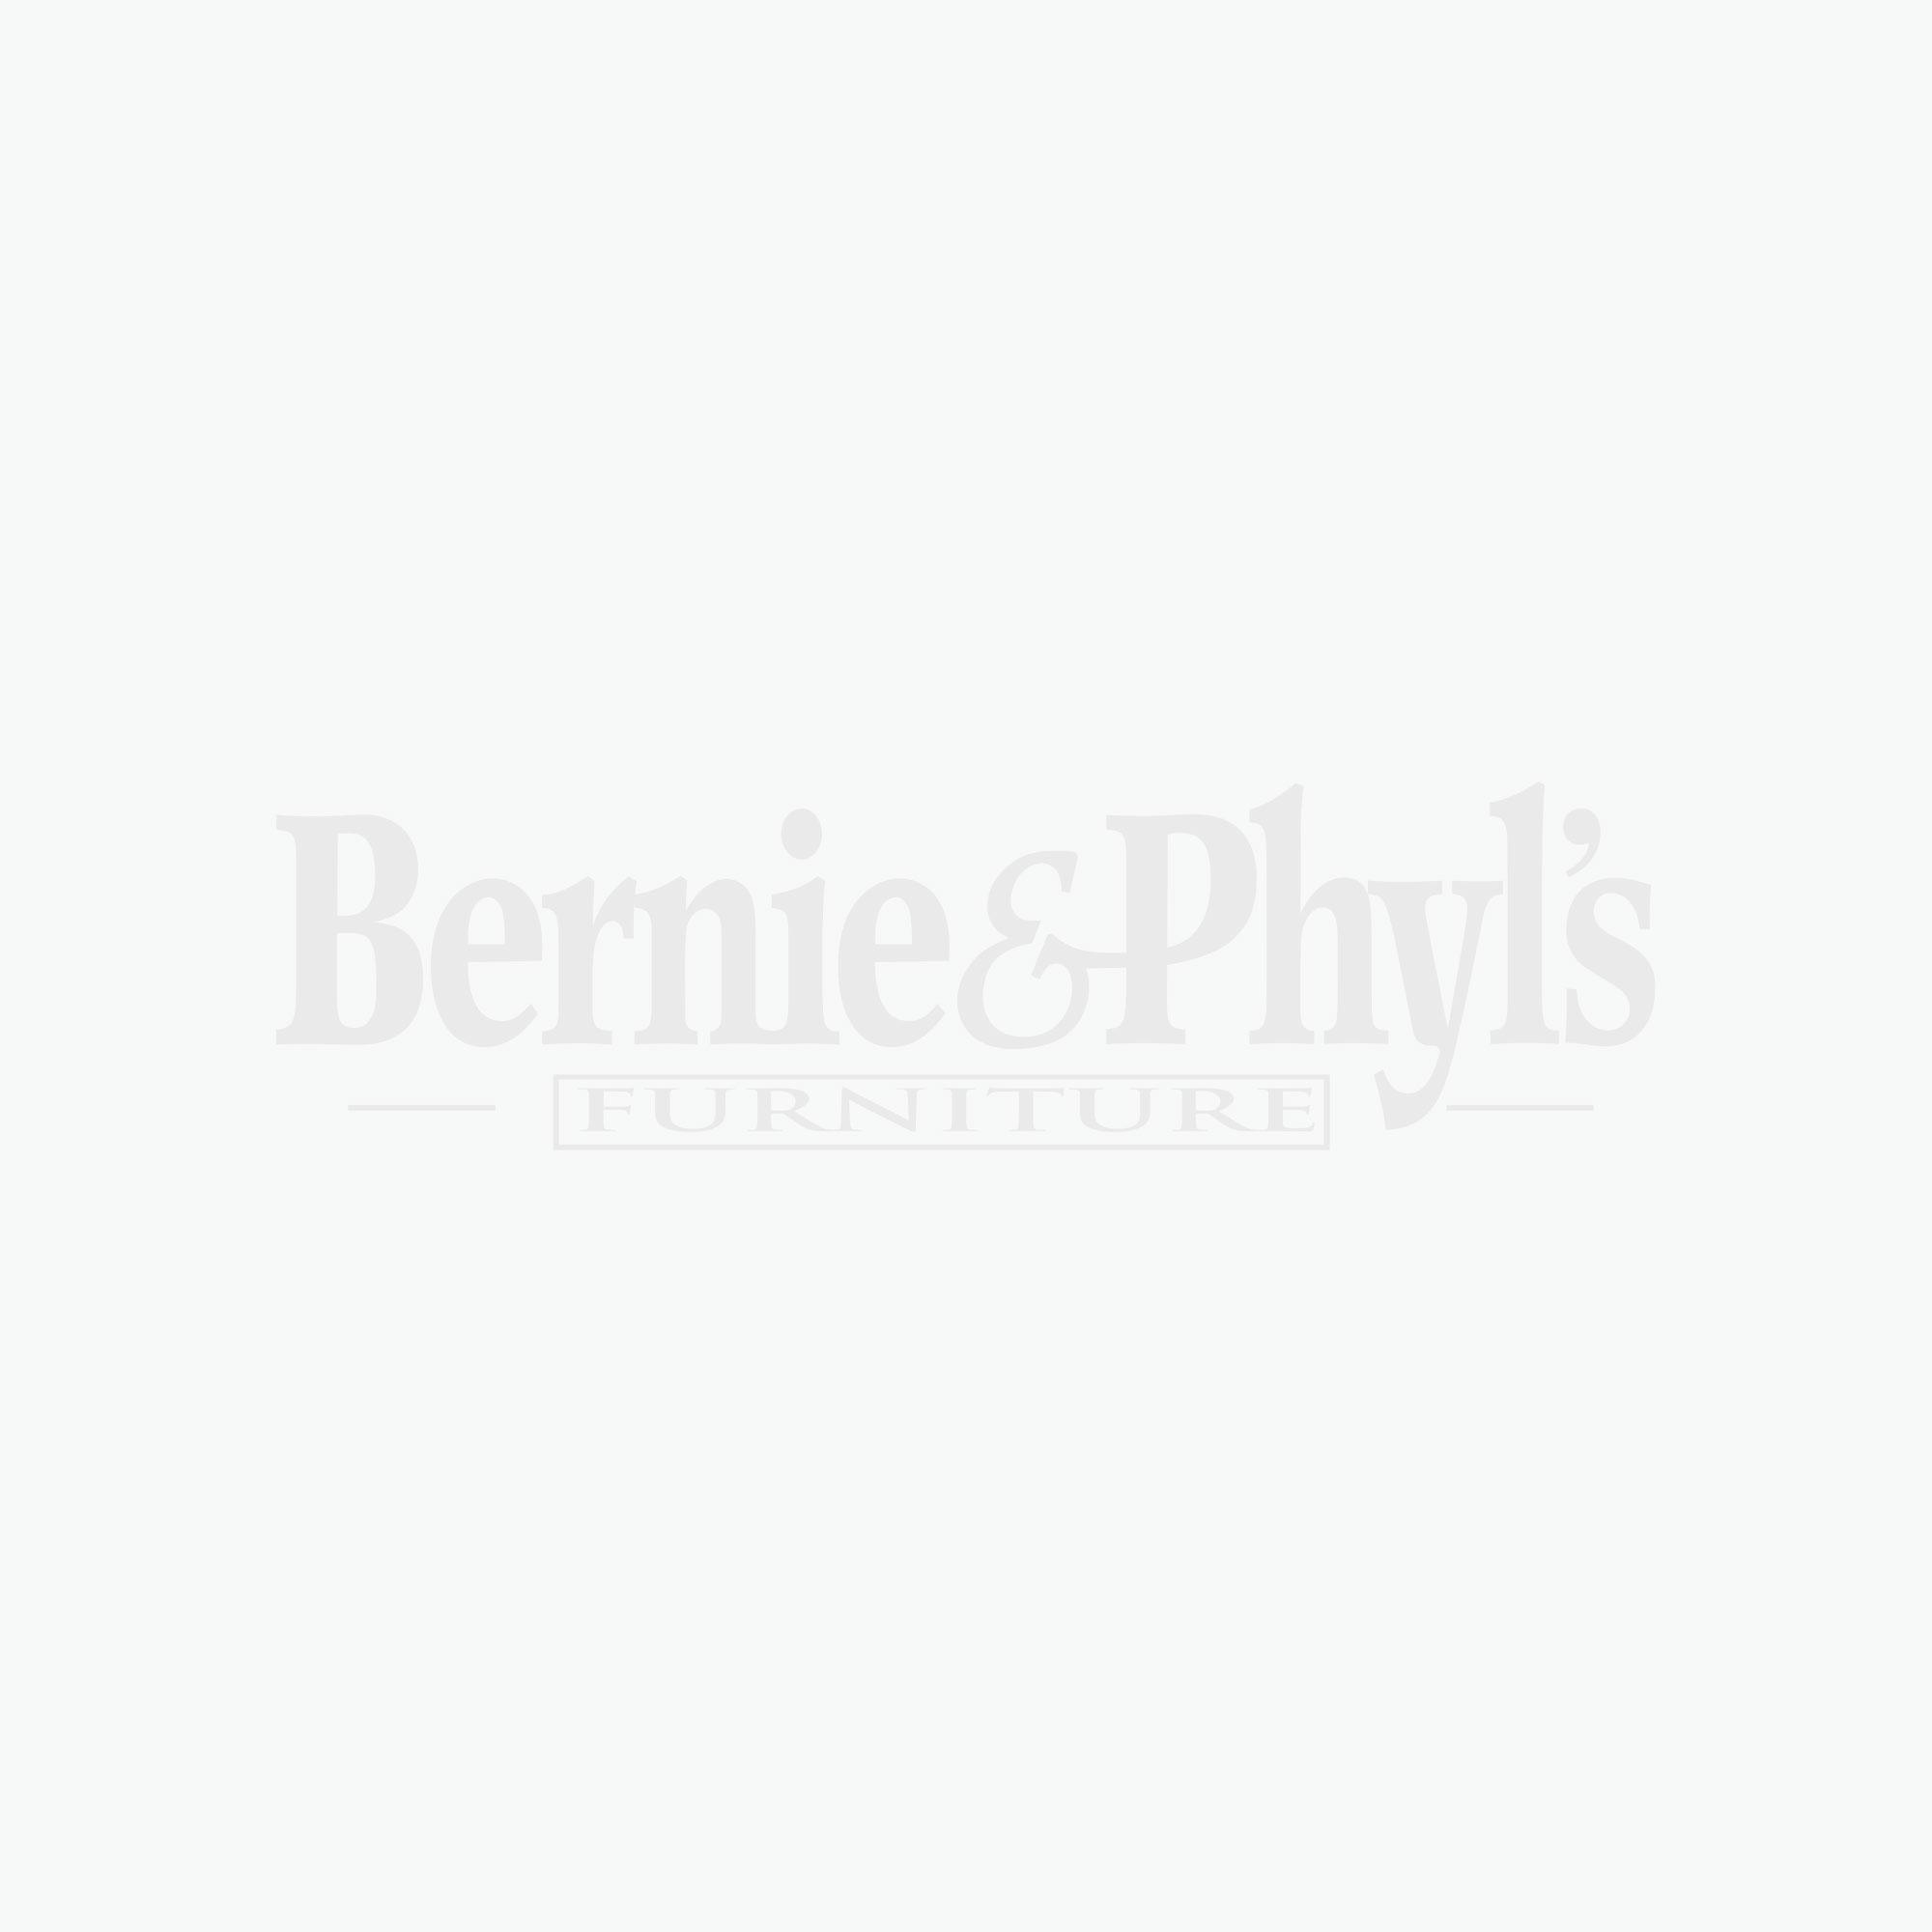 Malibu 3 Piece Sectional Bernie & Phyl s Furniture by England